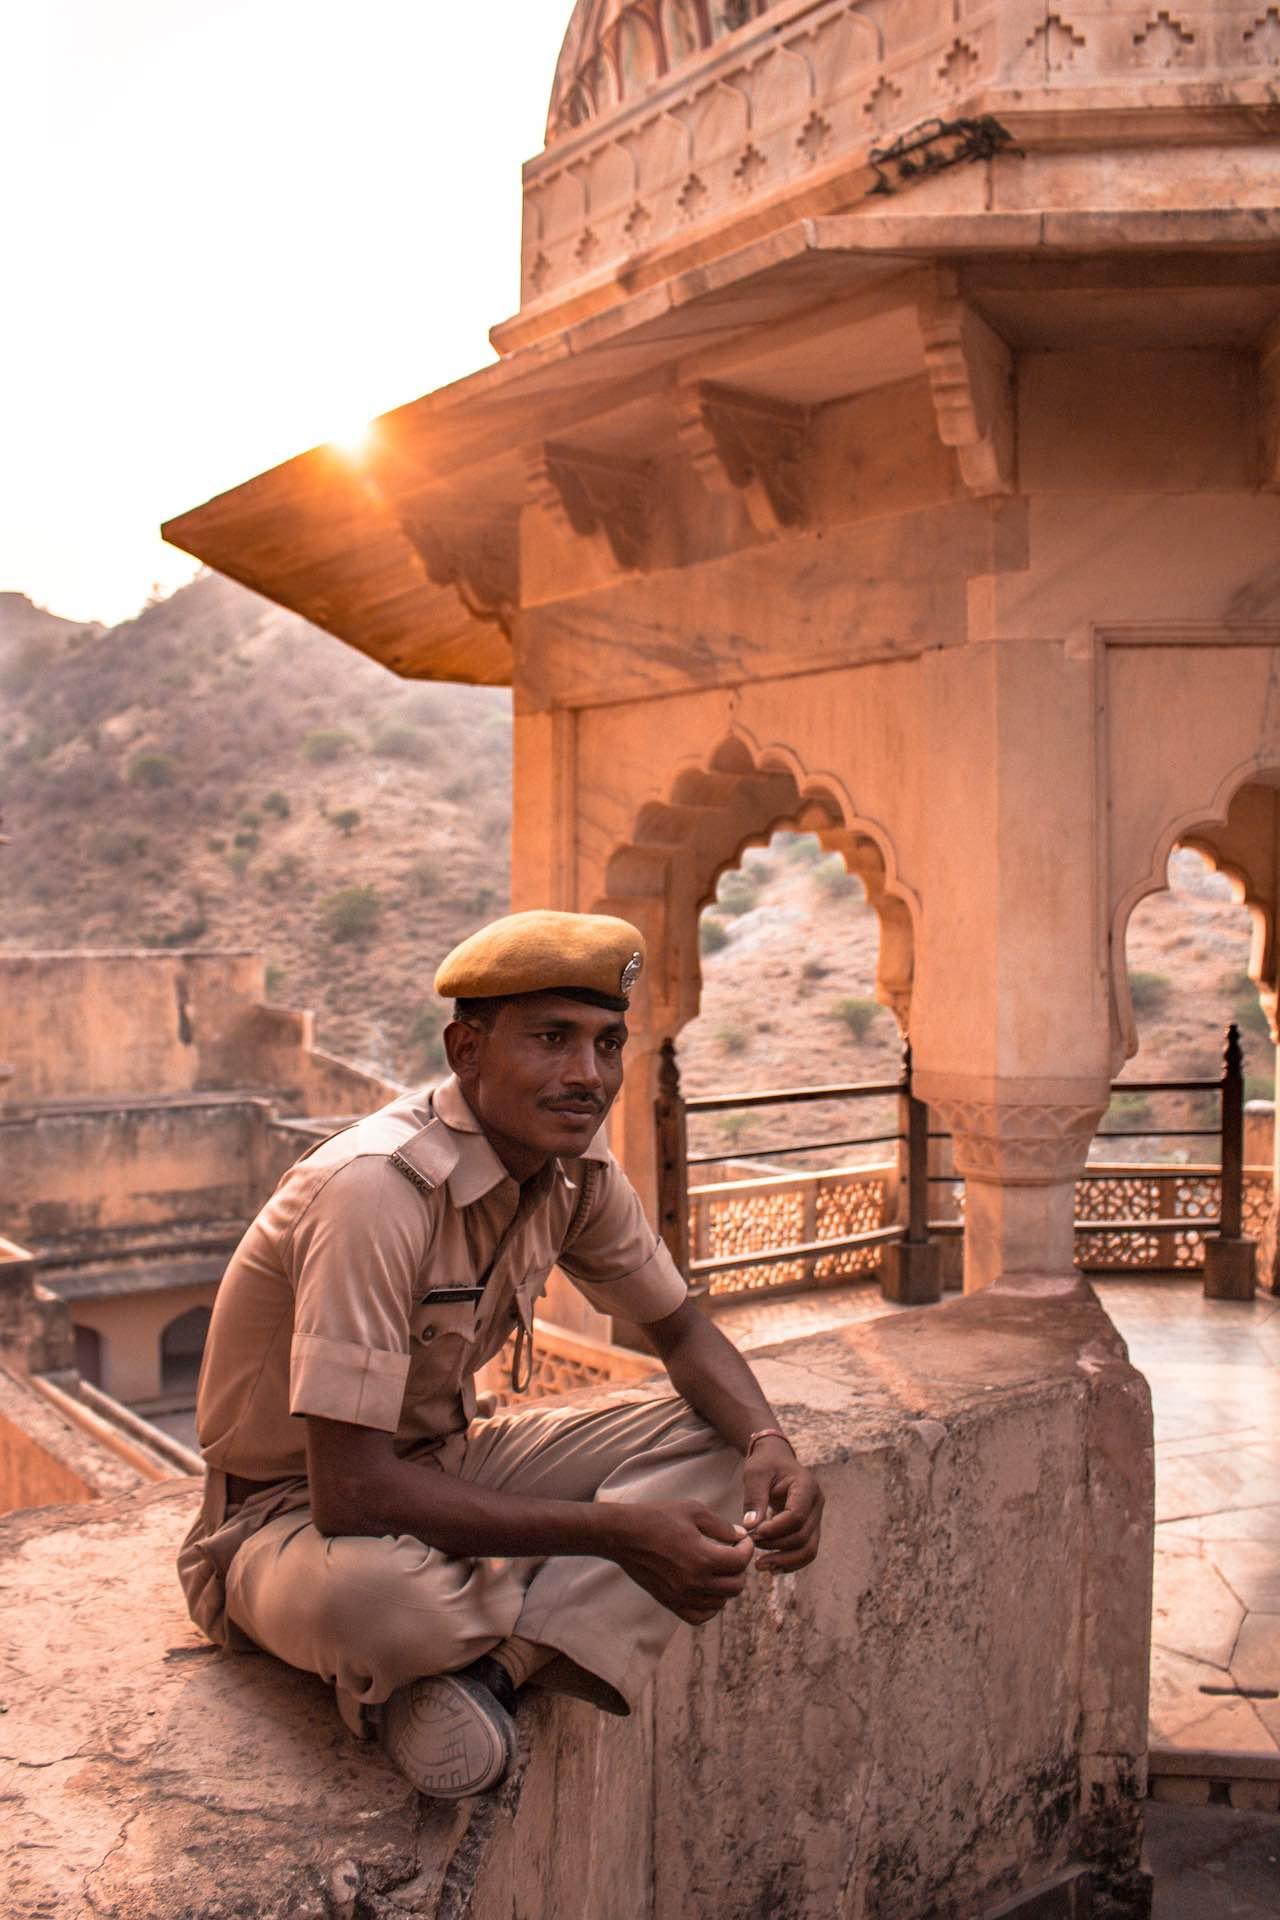 Policeman in Amber Palace, Jaipur, India